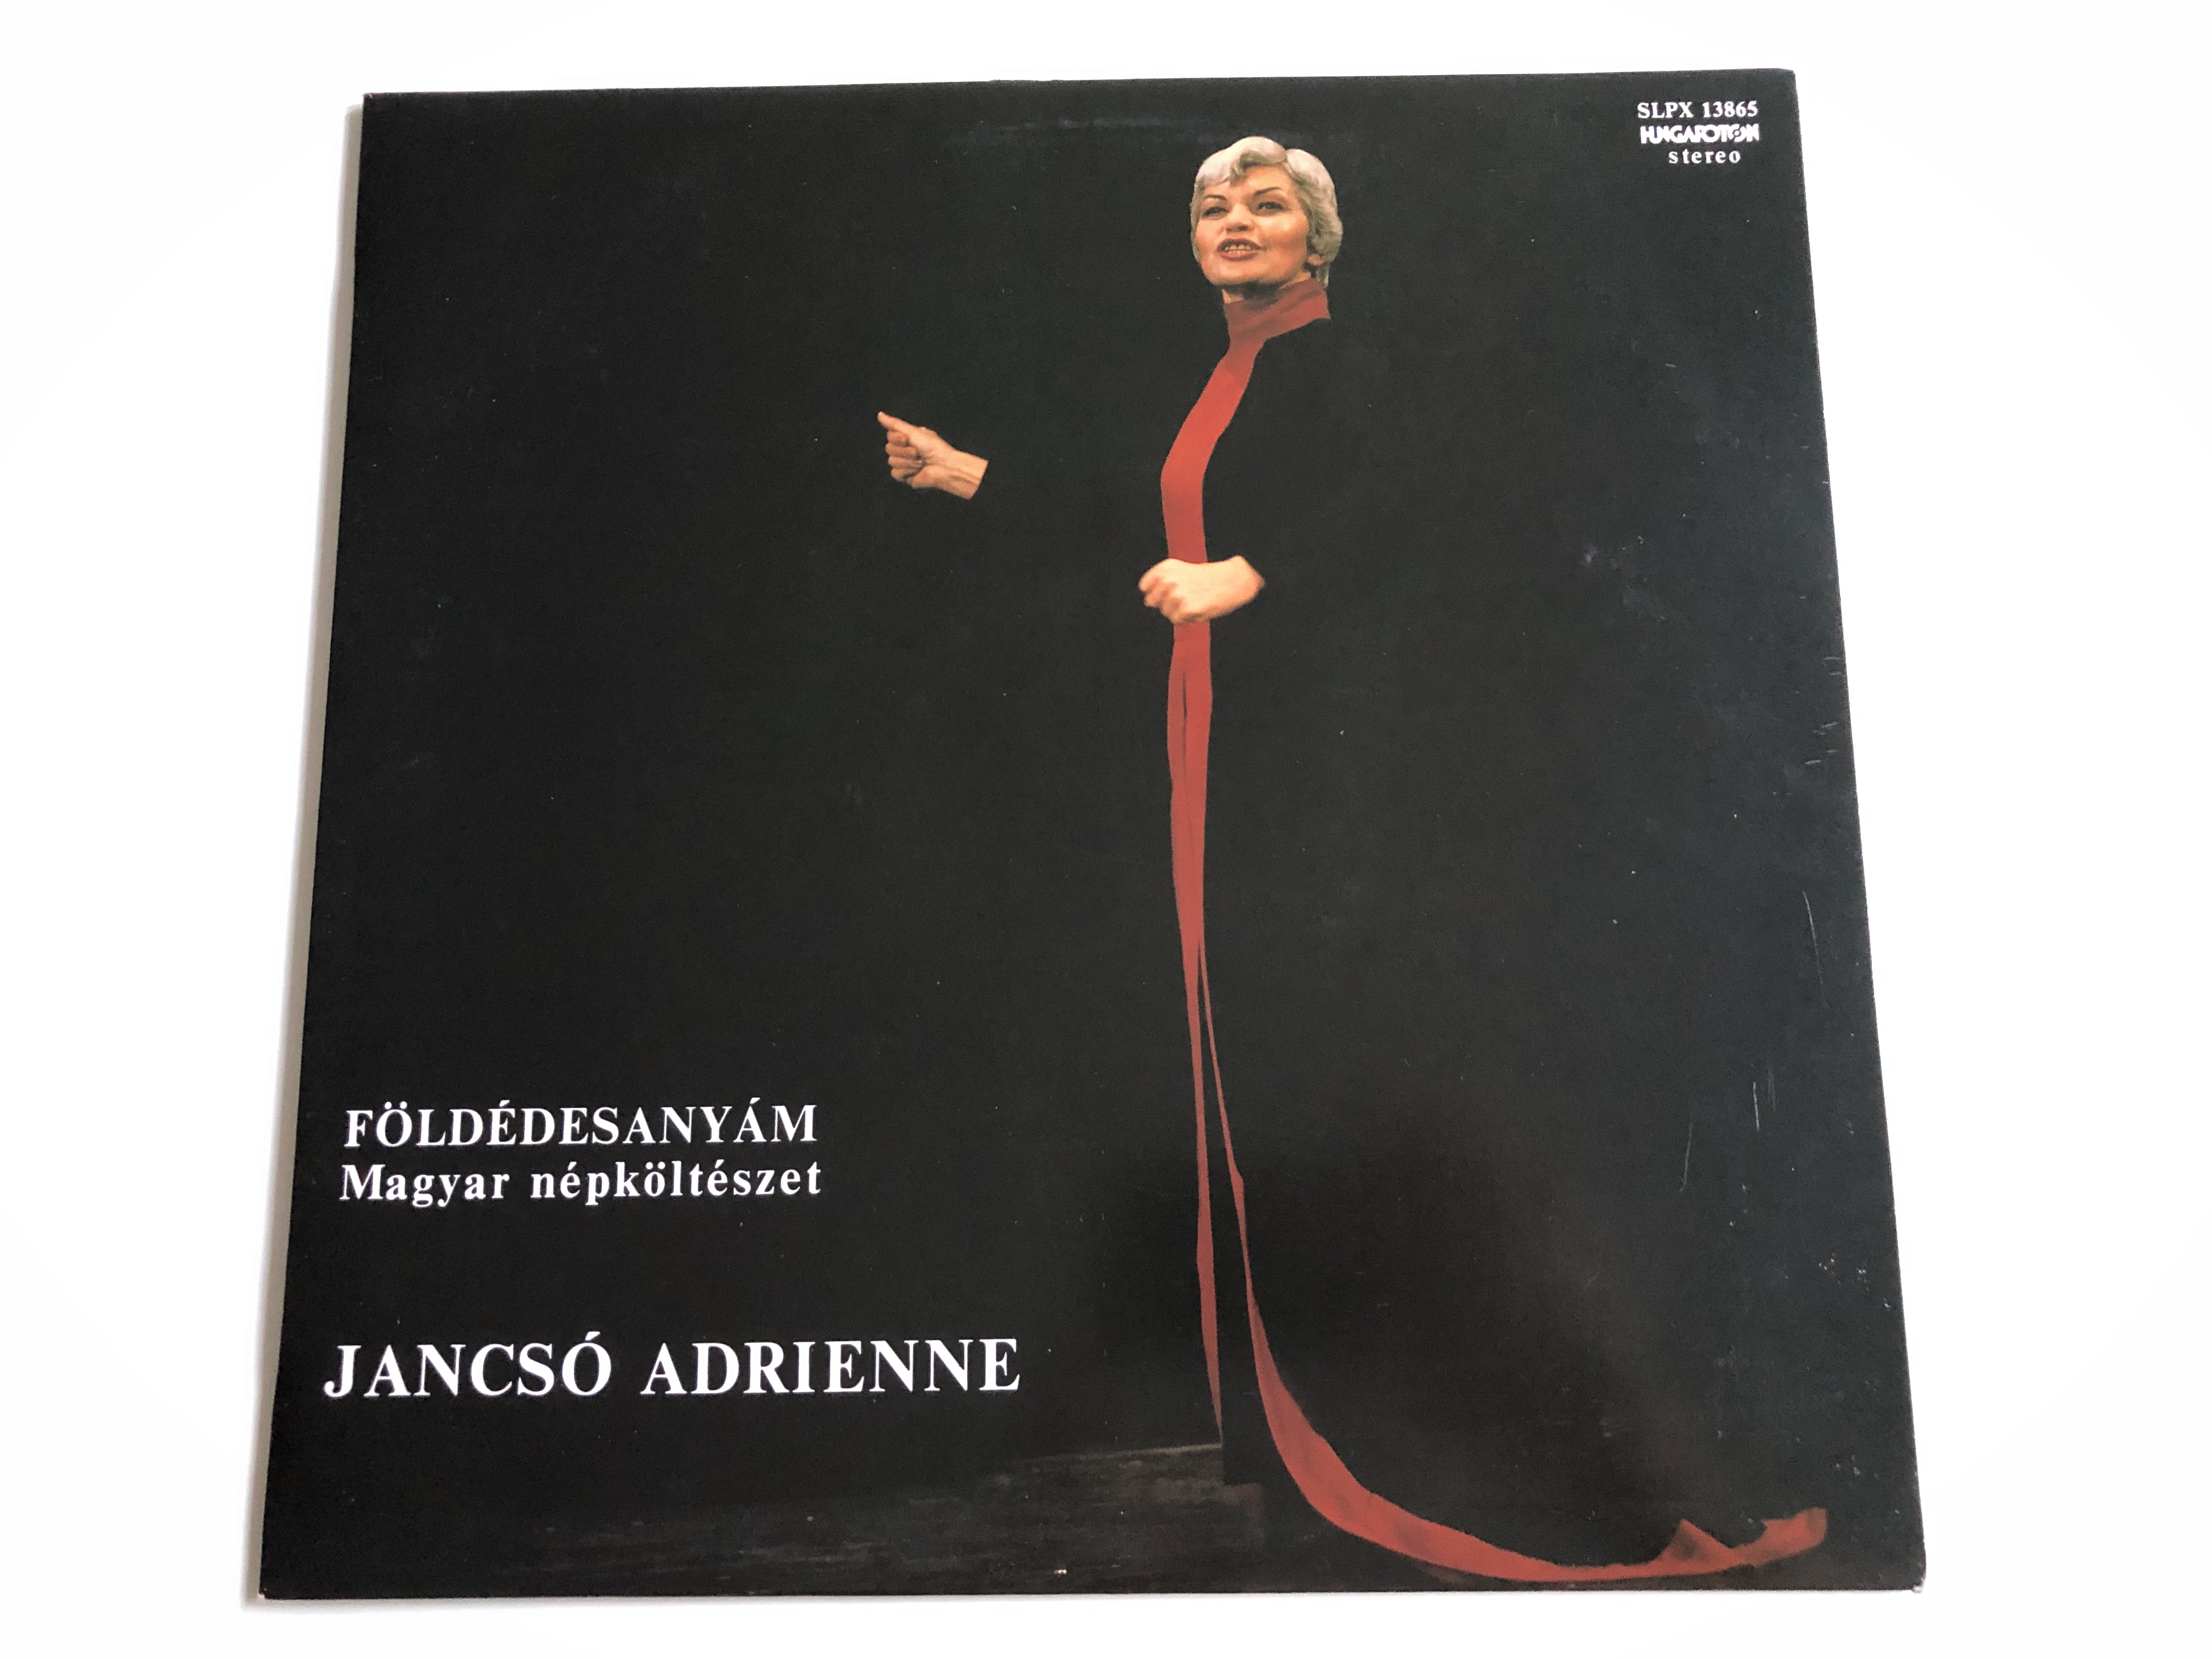 jancs-adrienne-f-ld-desany-m-magyar-n-pk-lt-szet-hungaroton-lp-stereo-slpx-13865-1-.jpg